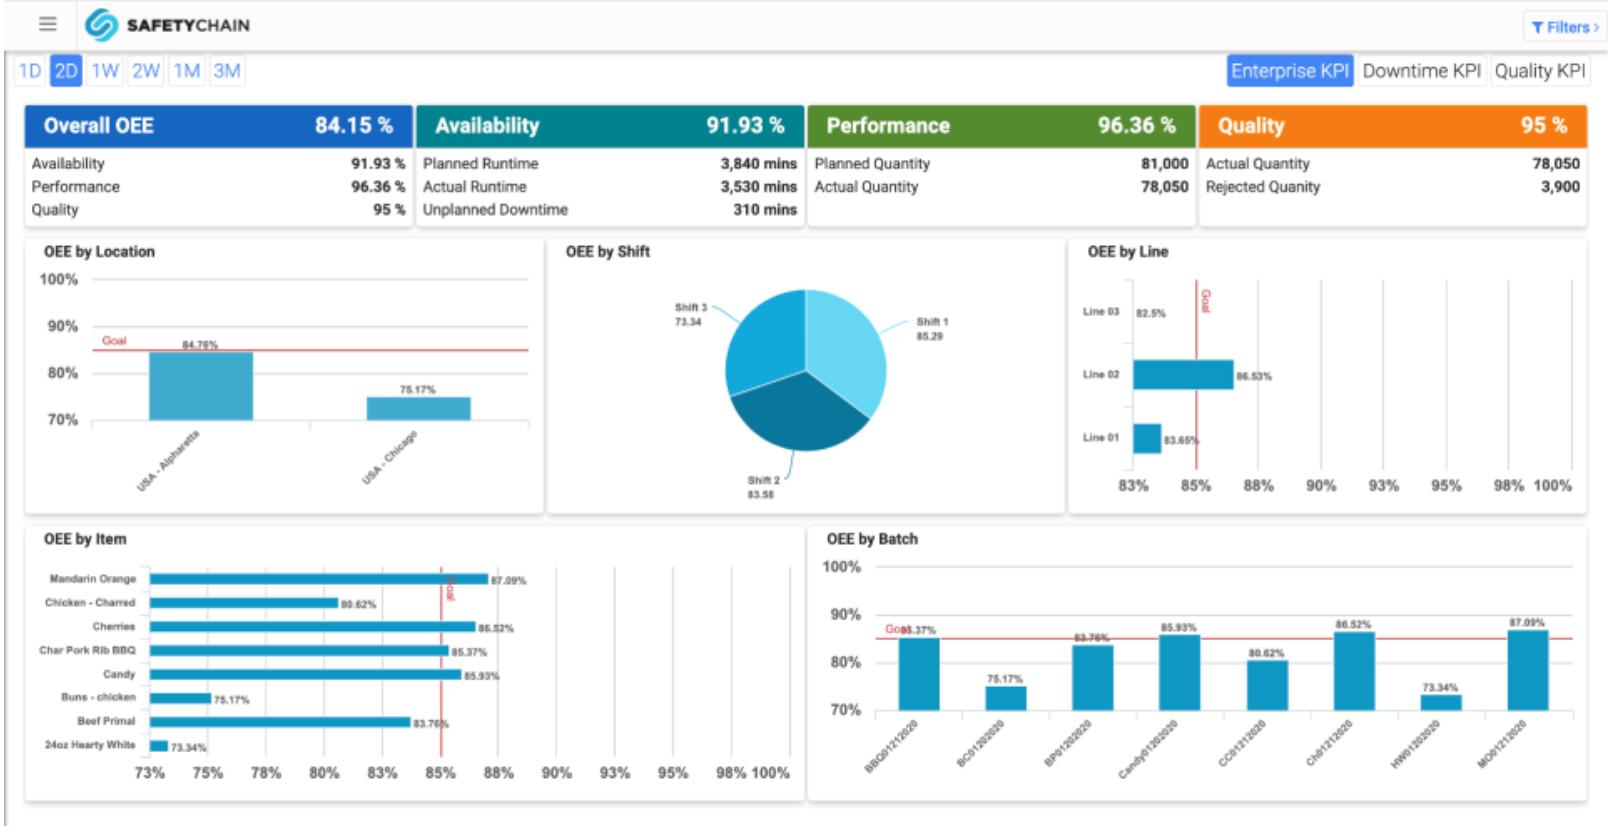 OEE Metrics, Including Availability, Performance, & Quality